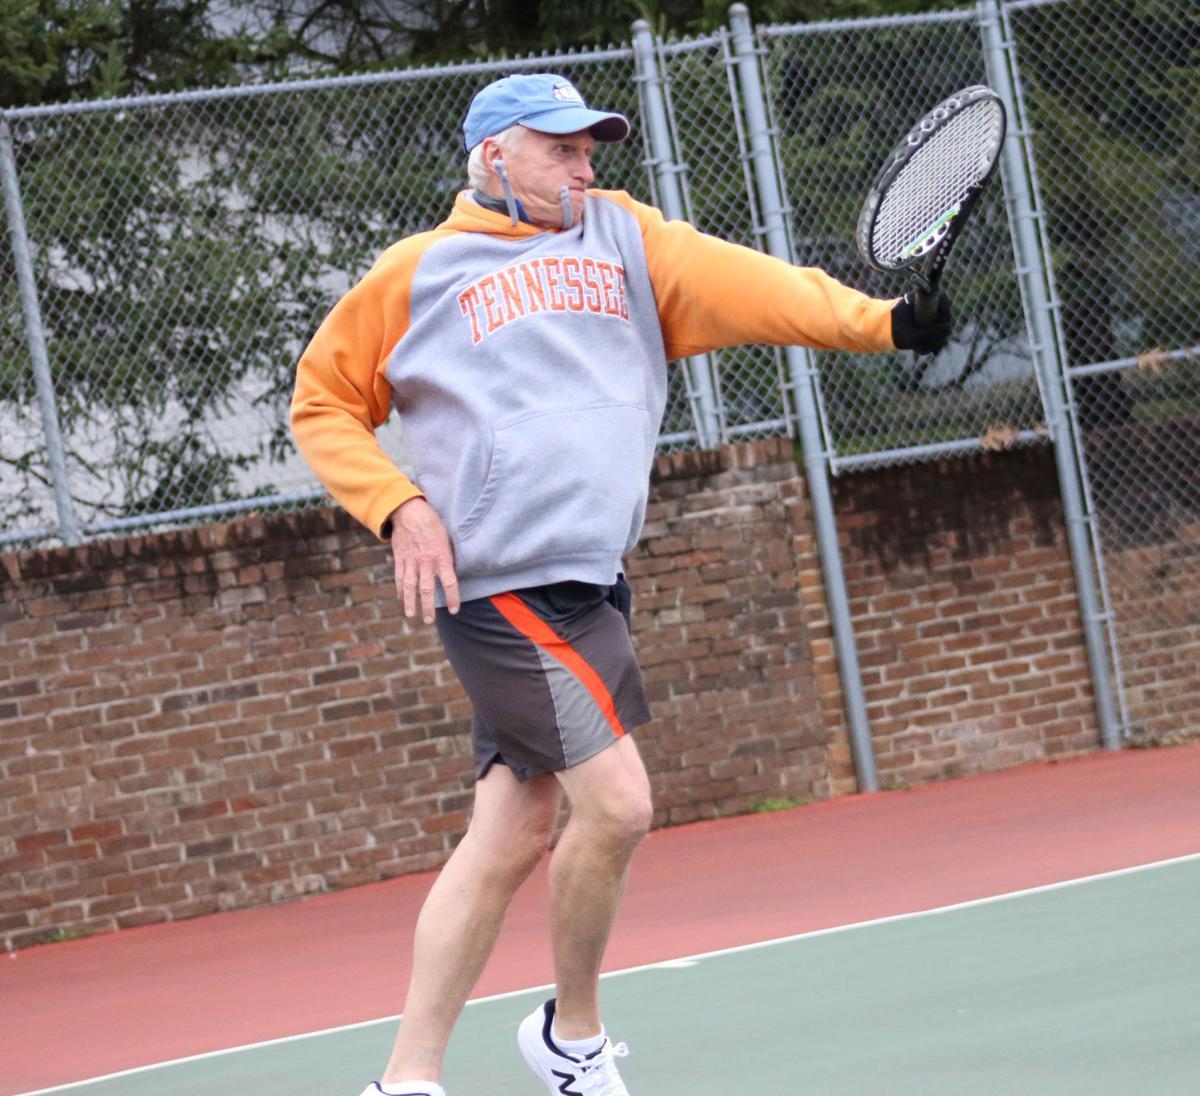 Bringing tennis back to Village